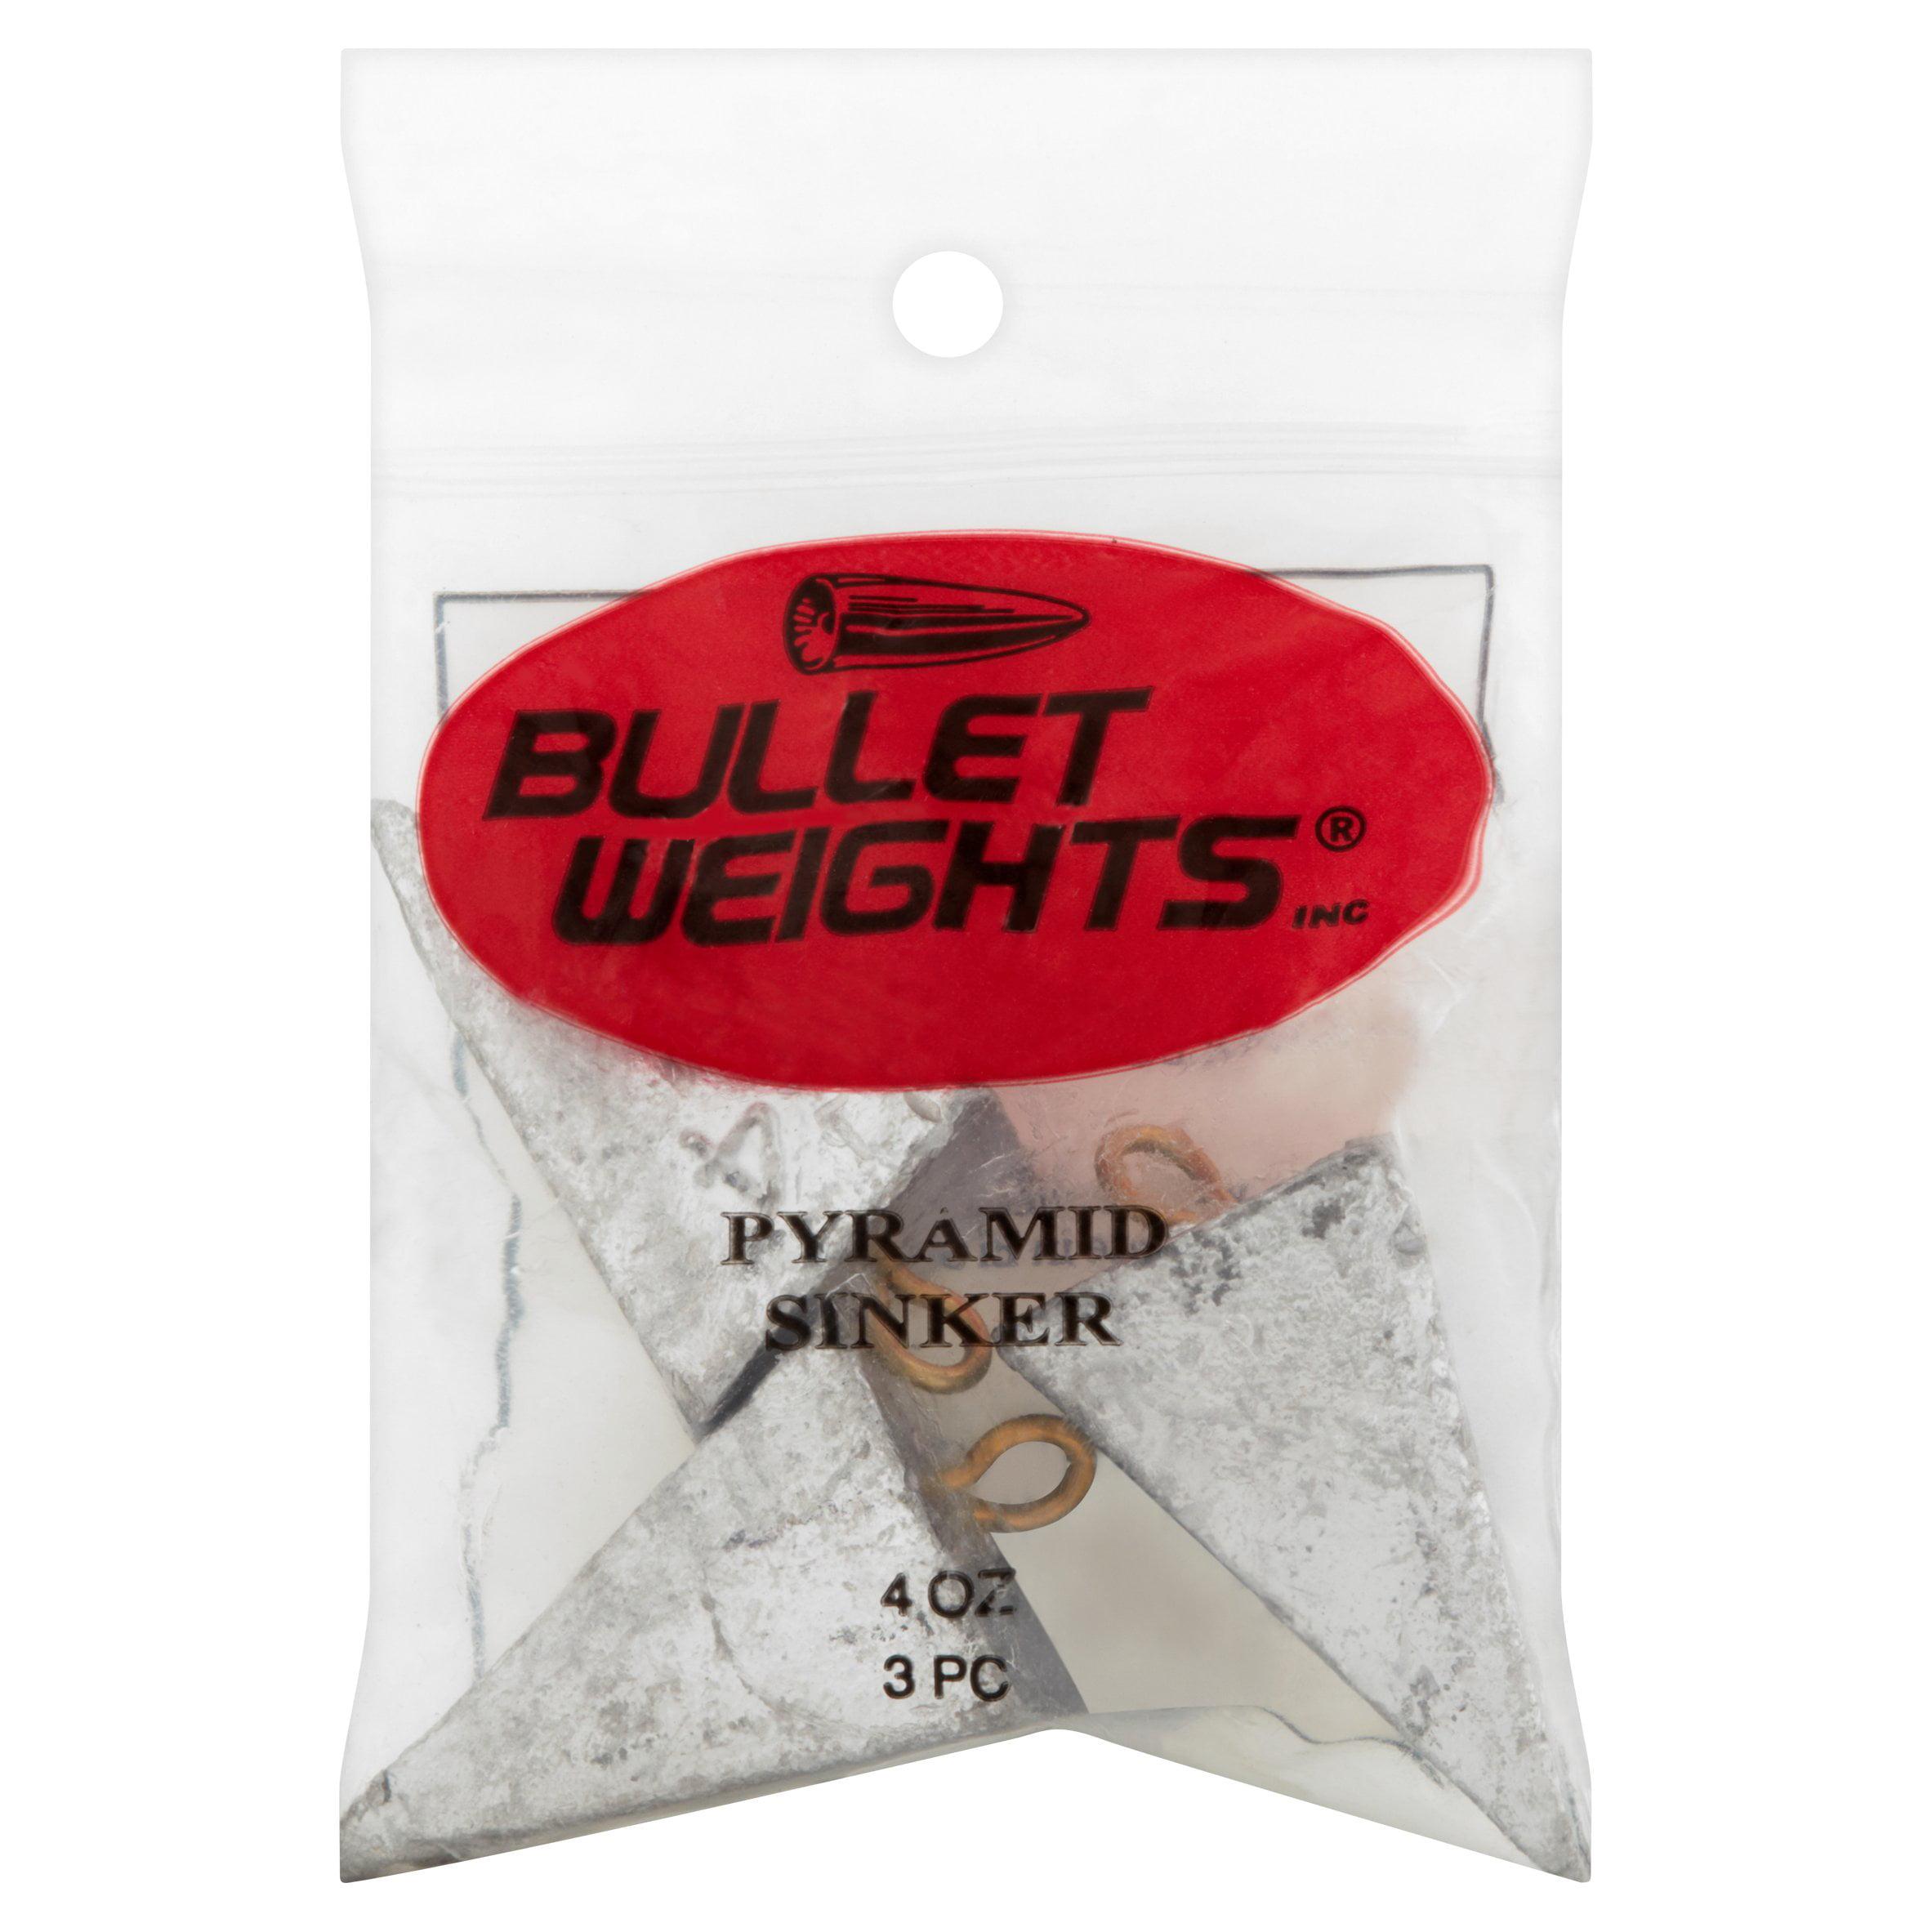 Bullet Weights® Pyramid Sinkers 4 oz 3 sinkers